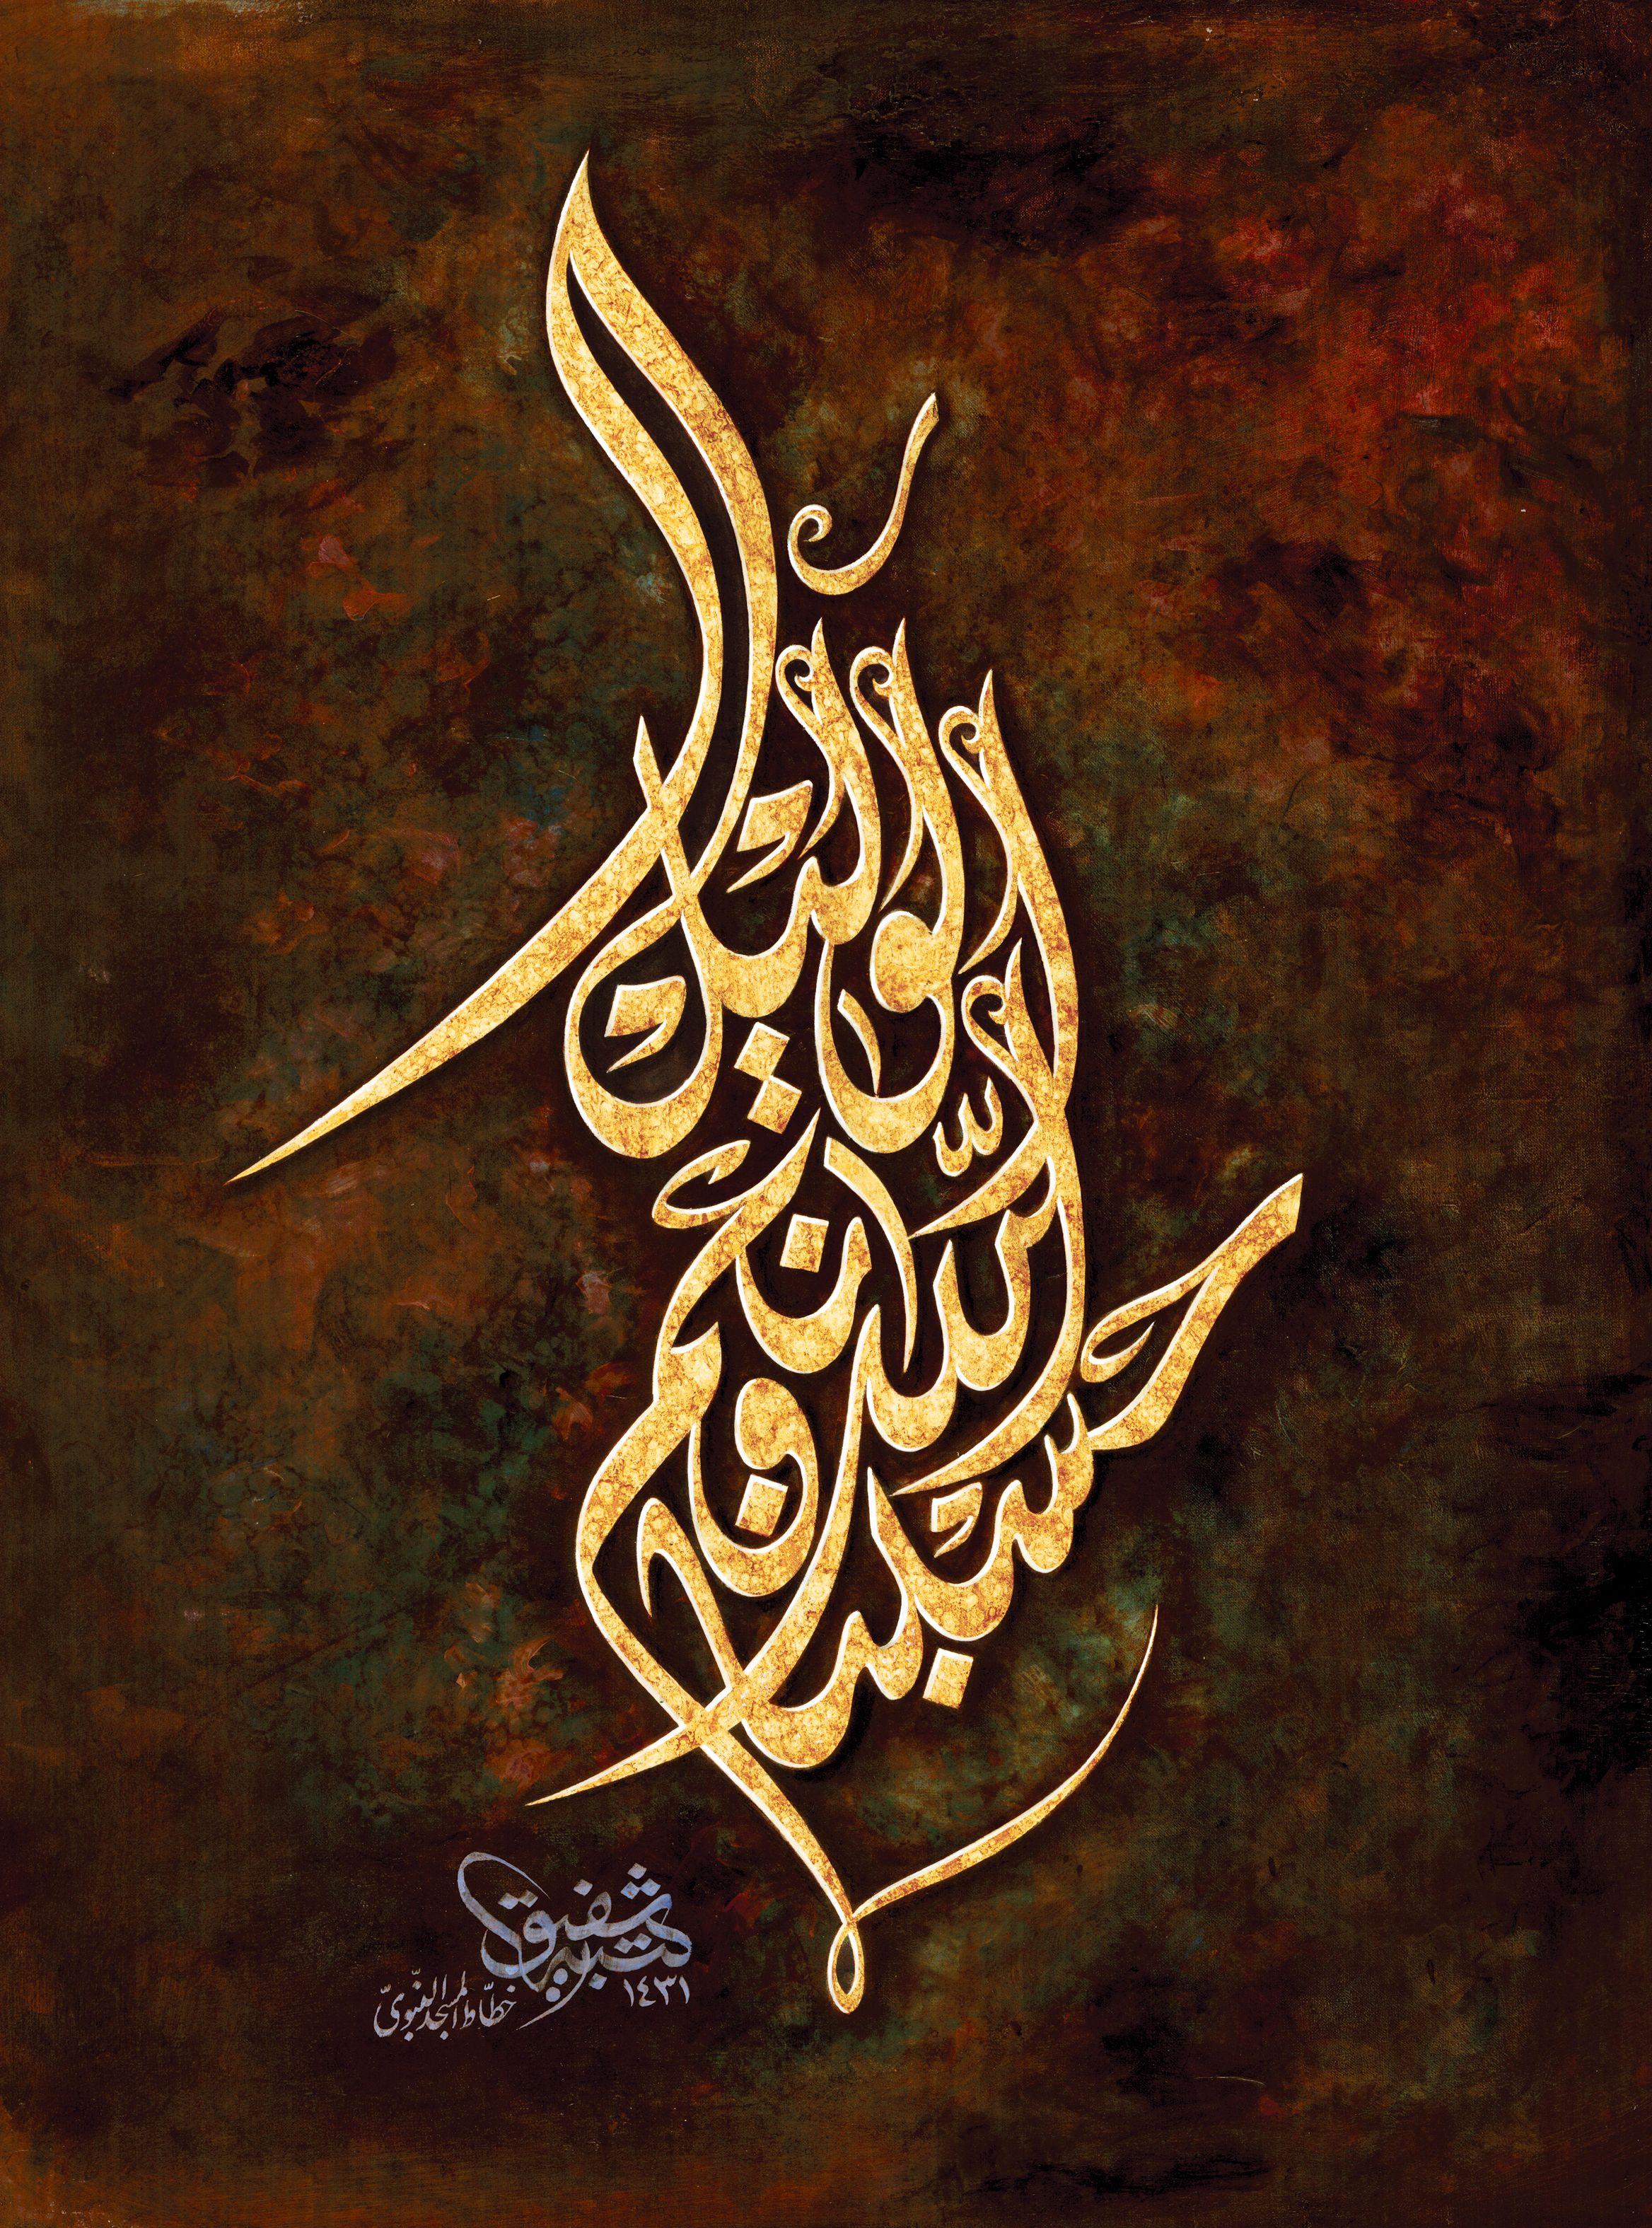 Desertrose عرض العمل الفني ملتقى مجمع الملك فهد لأشهر خطاطي المصحف الشريف في العالم Islamic Art Islamic Art Calligraphy Islamic Paintings